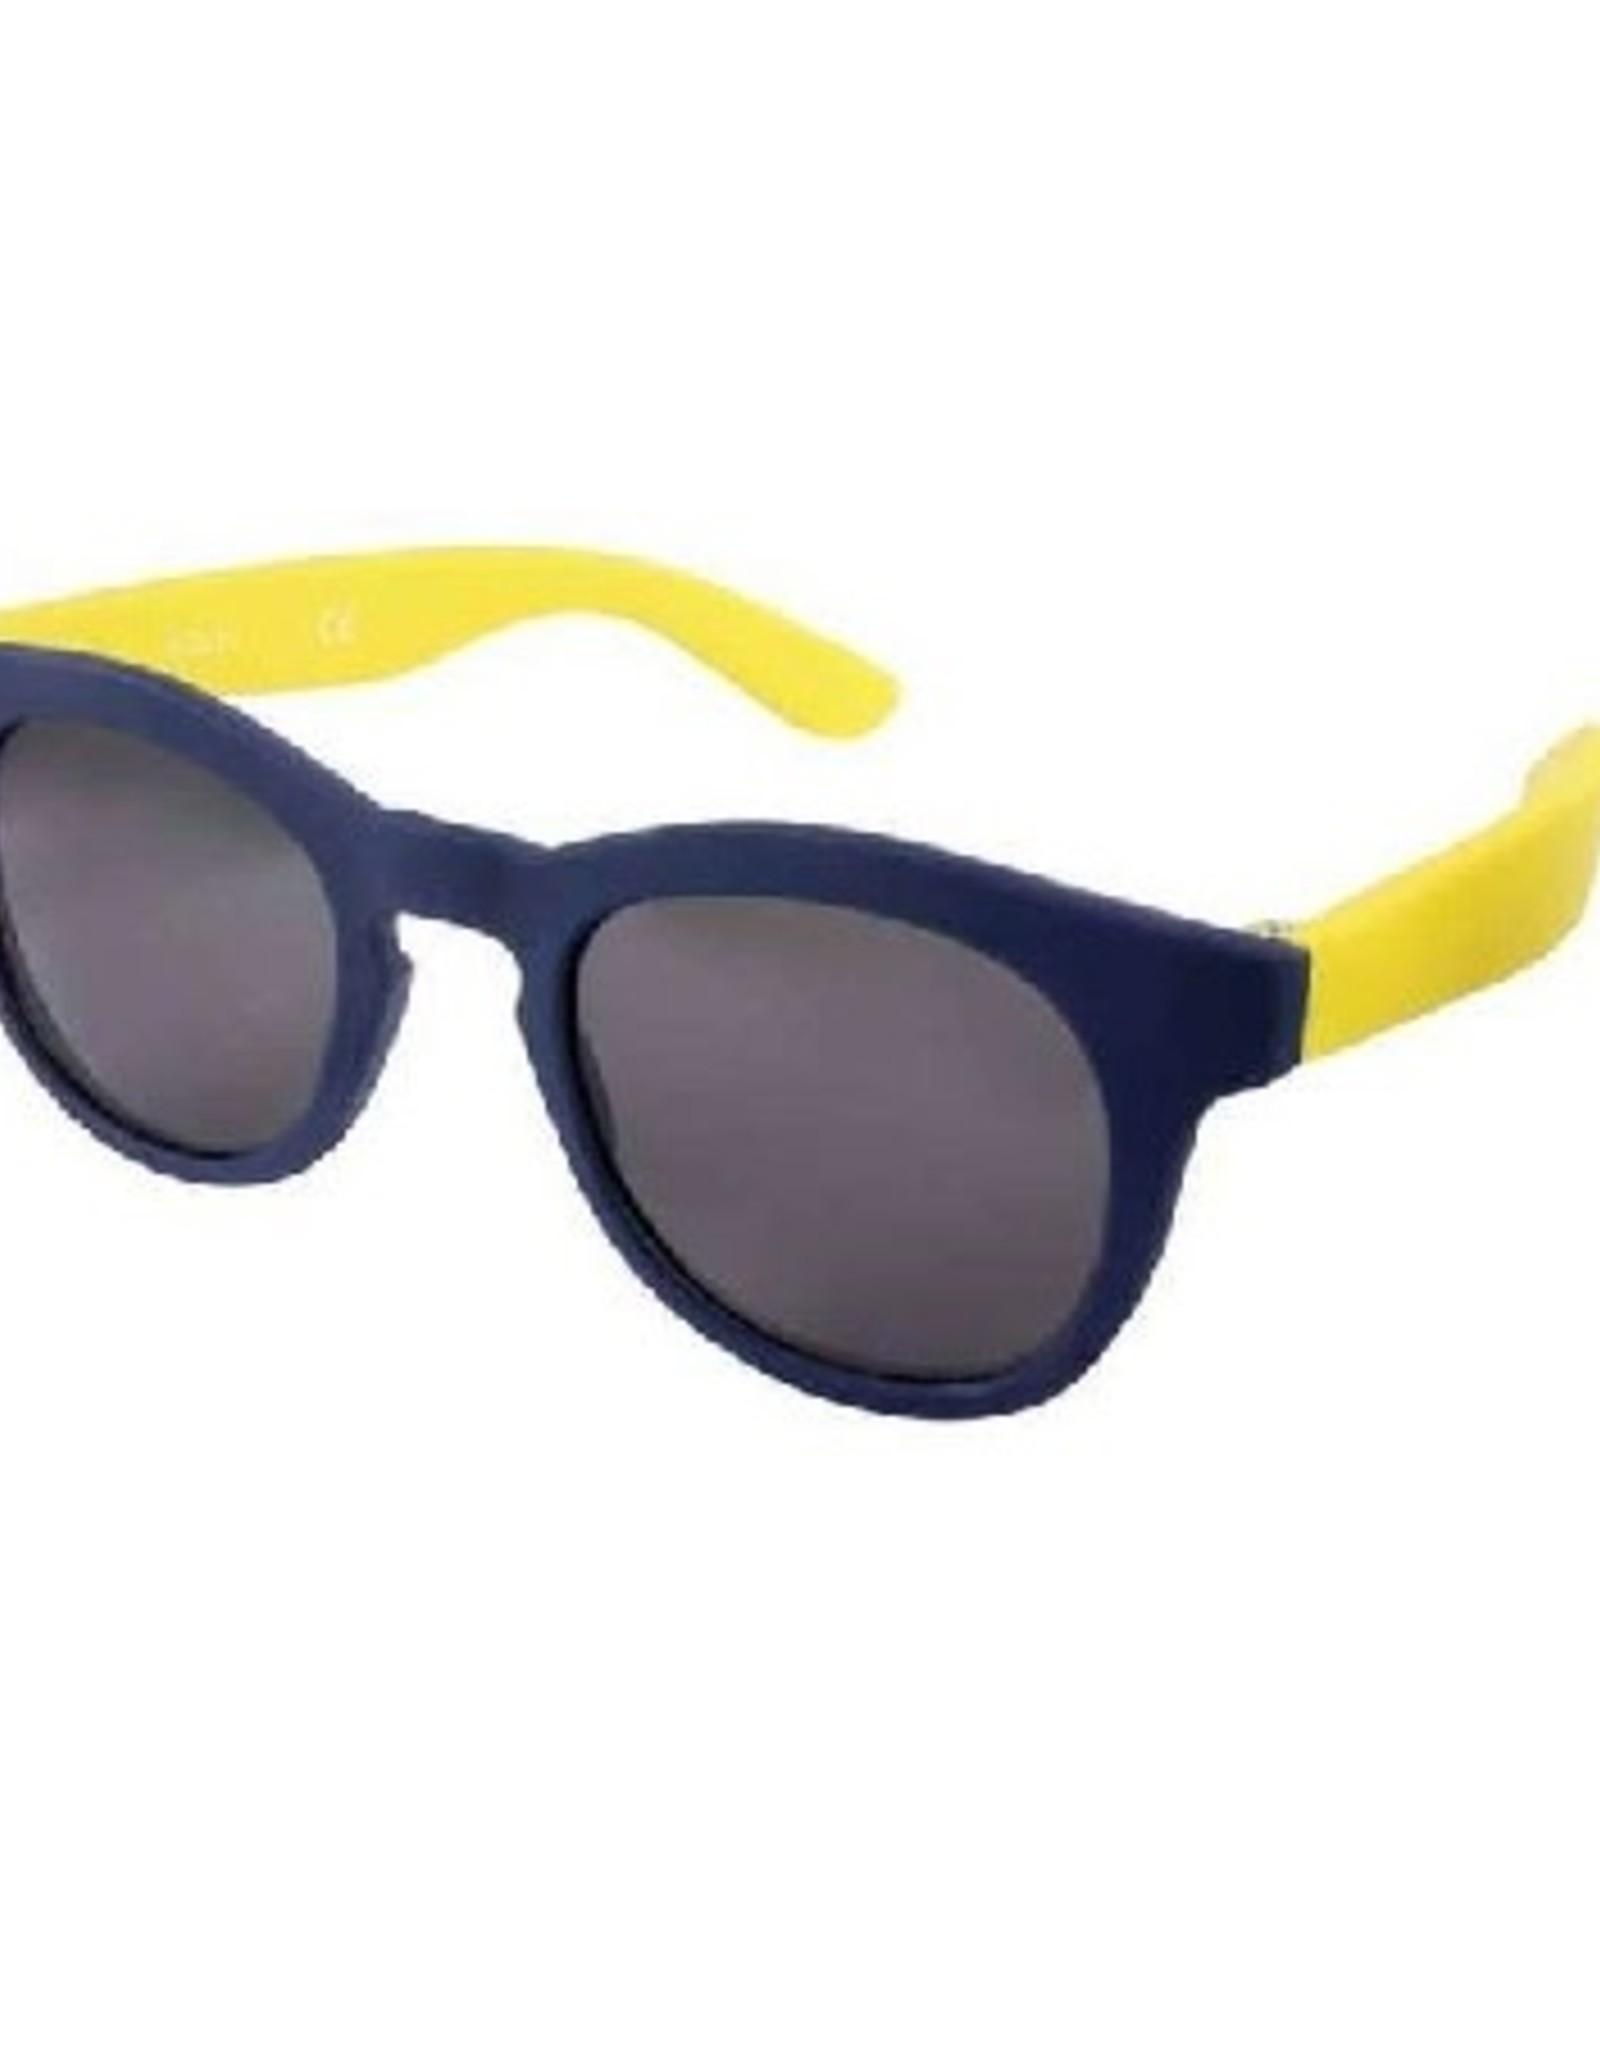 Zonnebril Flex RB navy/geel